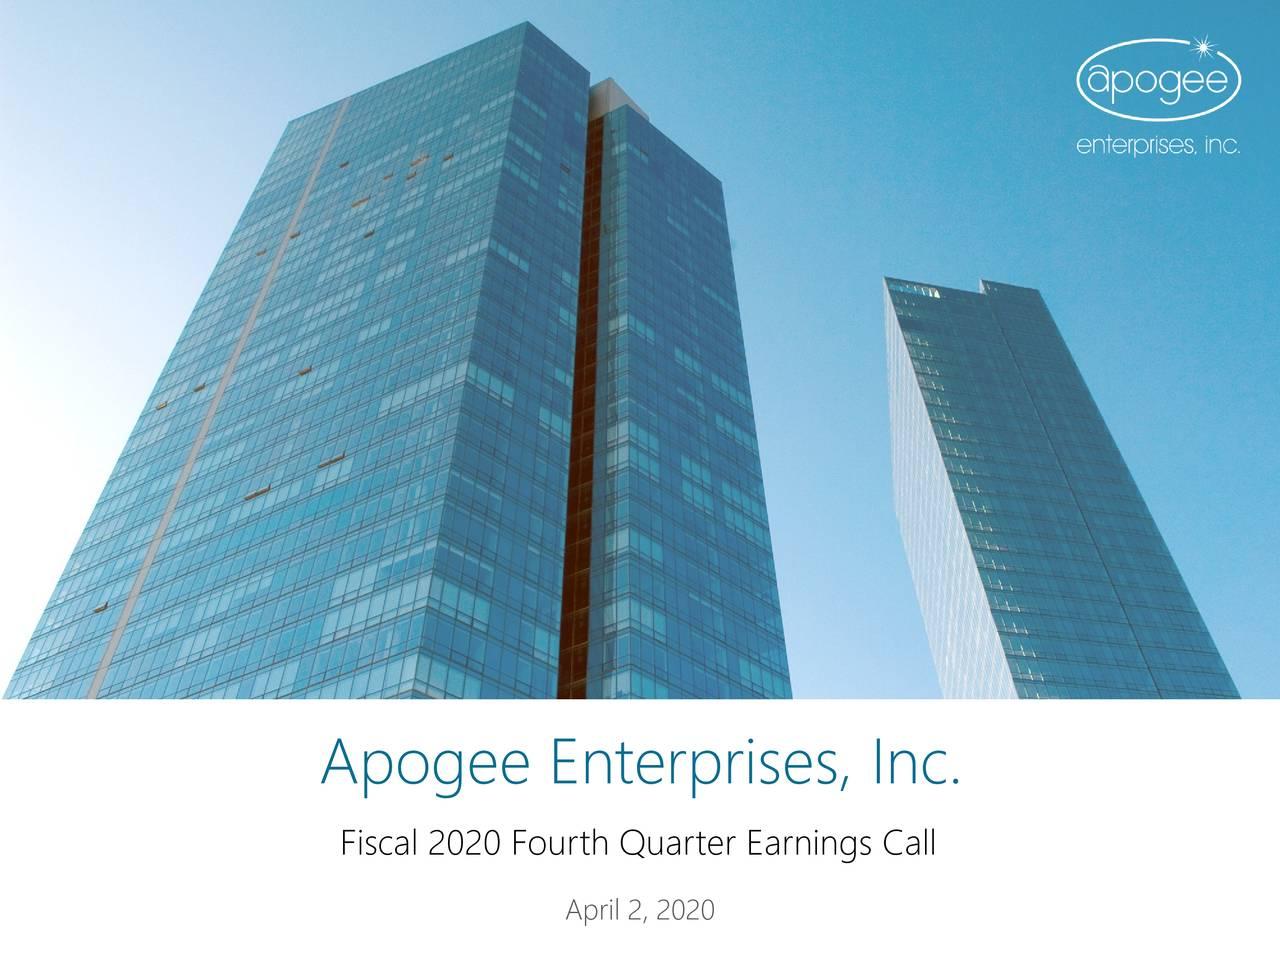 Apogee Enterprises, Inc. 2020 Q4 - Results - Earnings Call Presentation